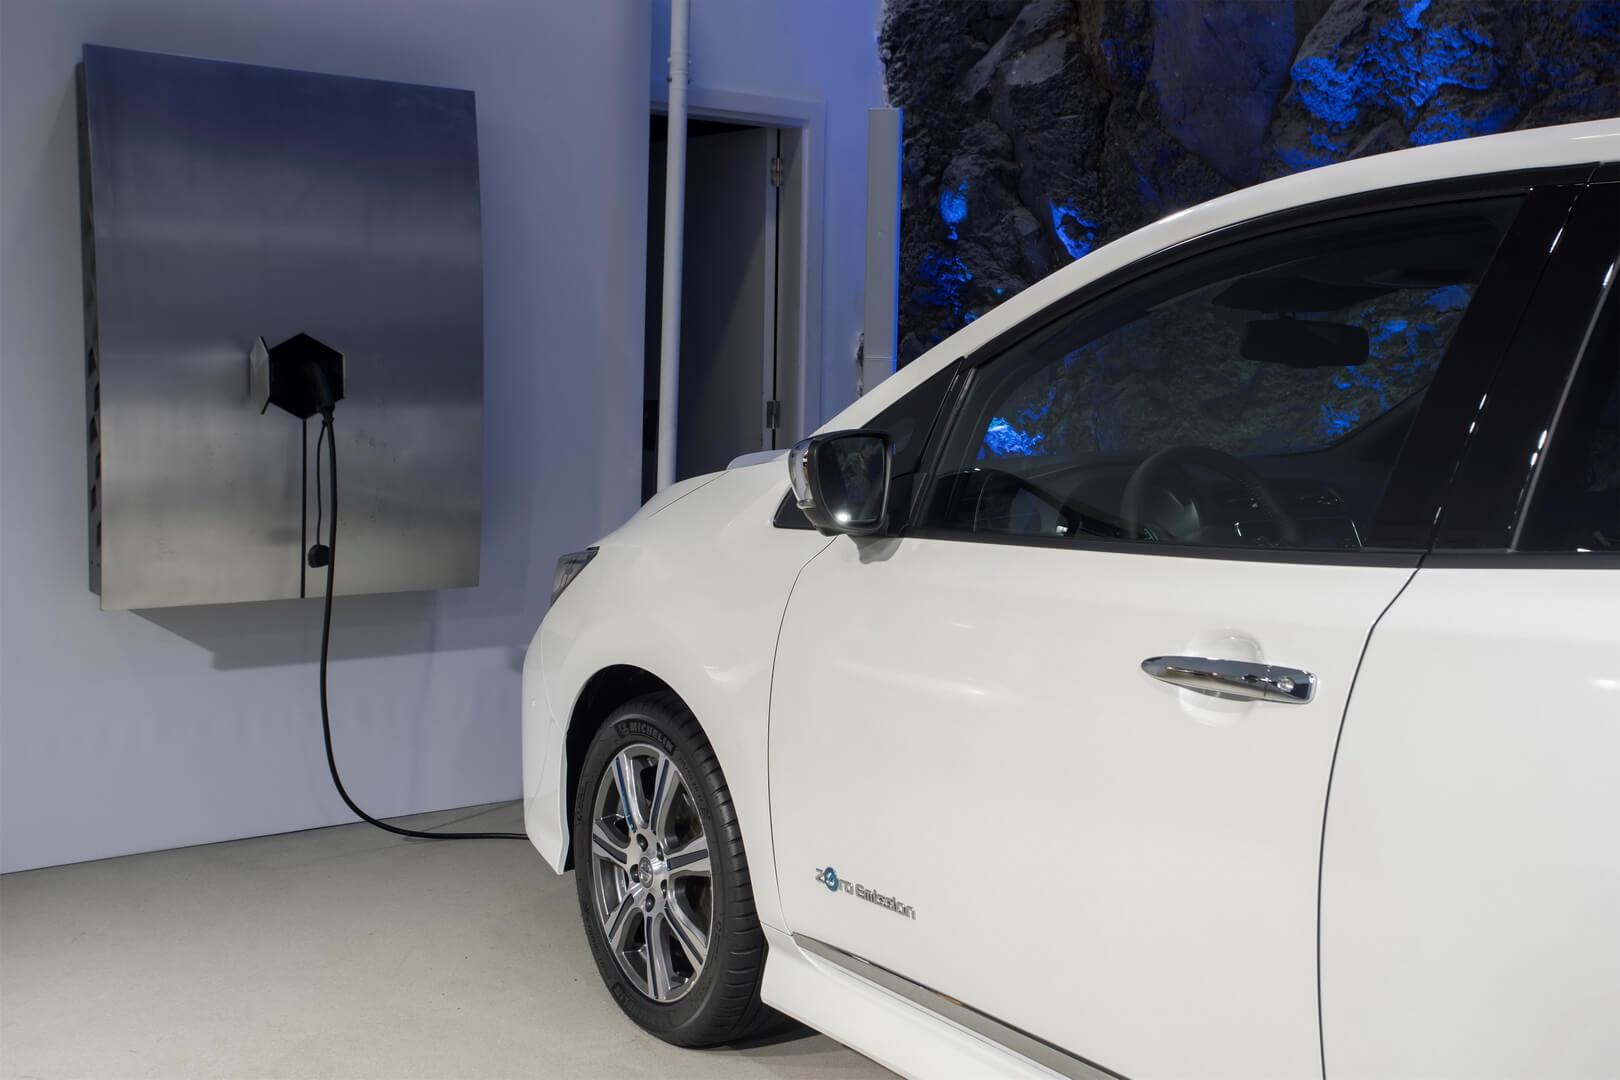 Зарядка Nissan Leaf 2018 от блока хранения энергии xStorage